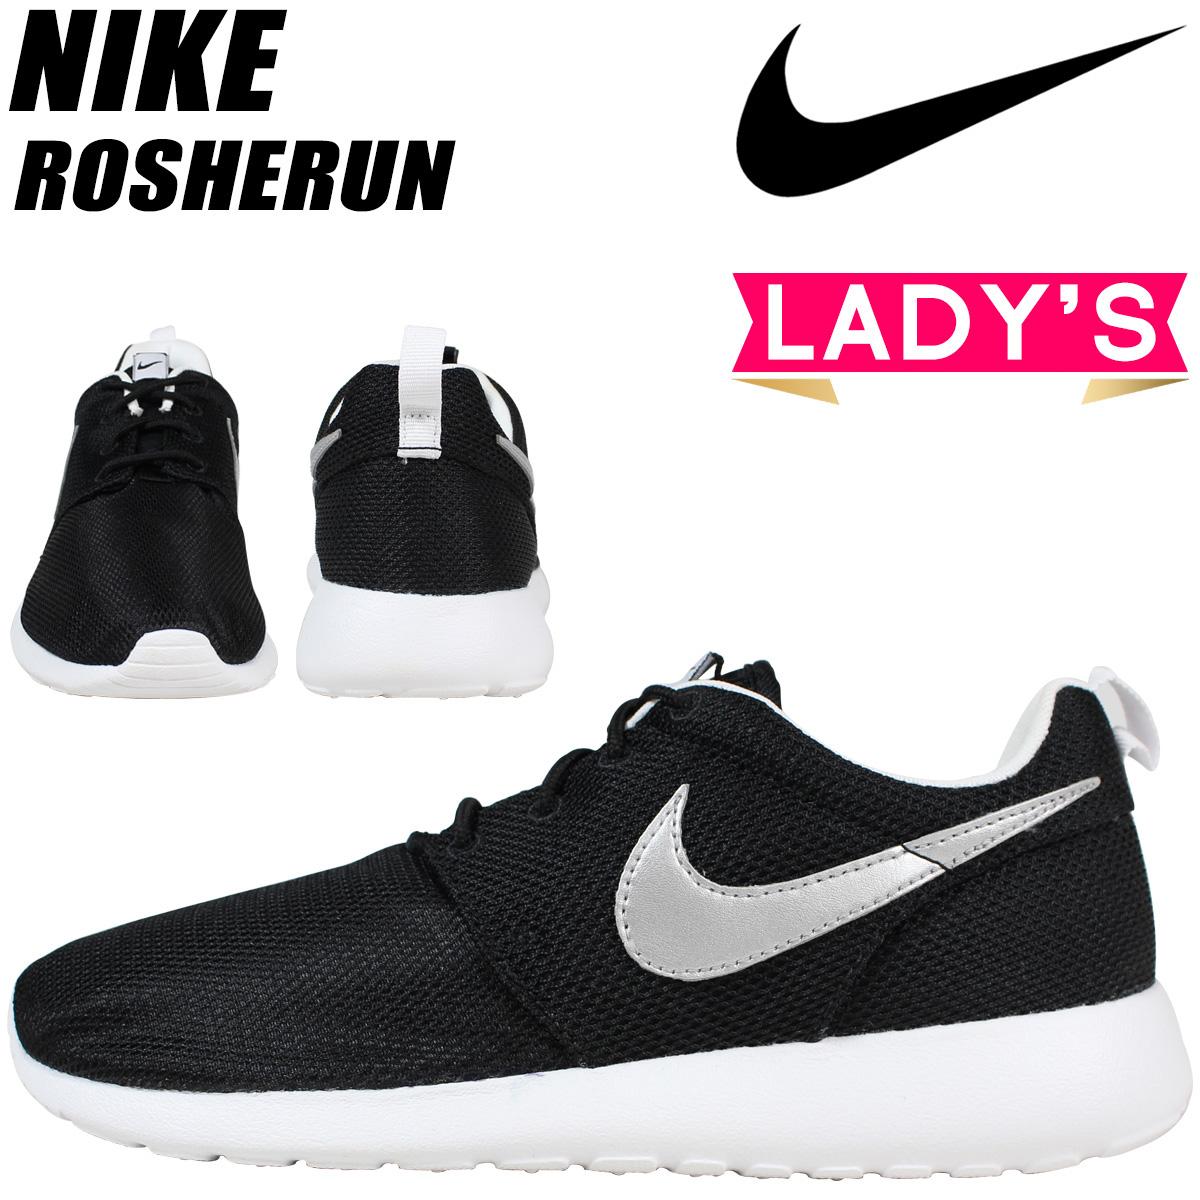 shoes 007 NIKE sneaker ROSHERUN GS black Roslin Nike women's 599728 srthdCQ